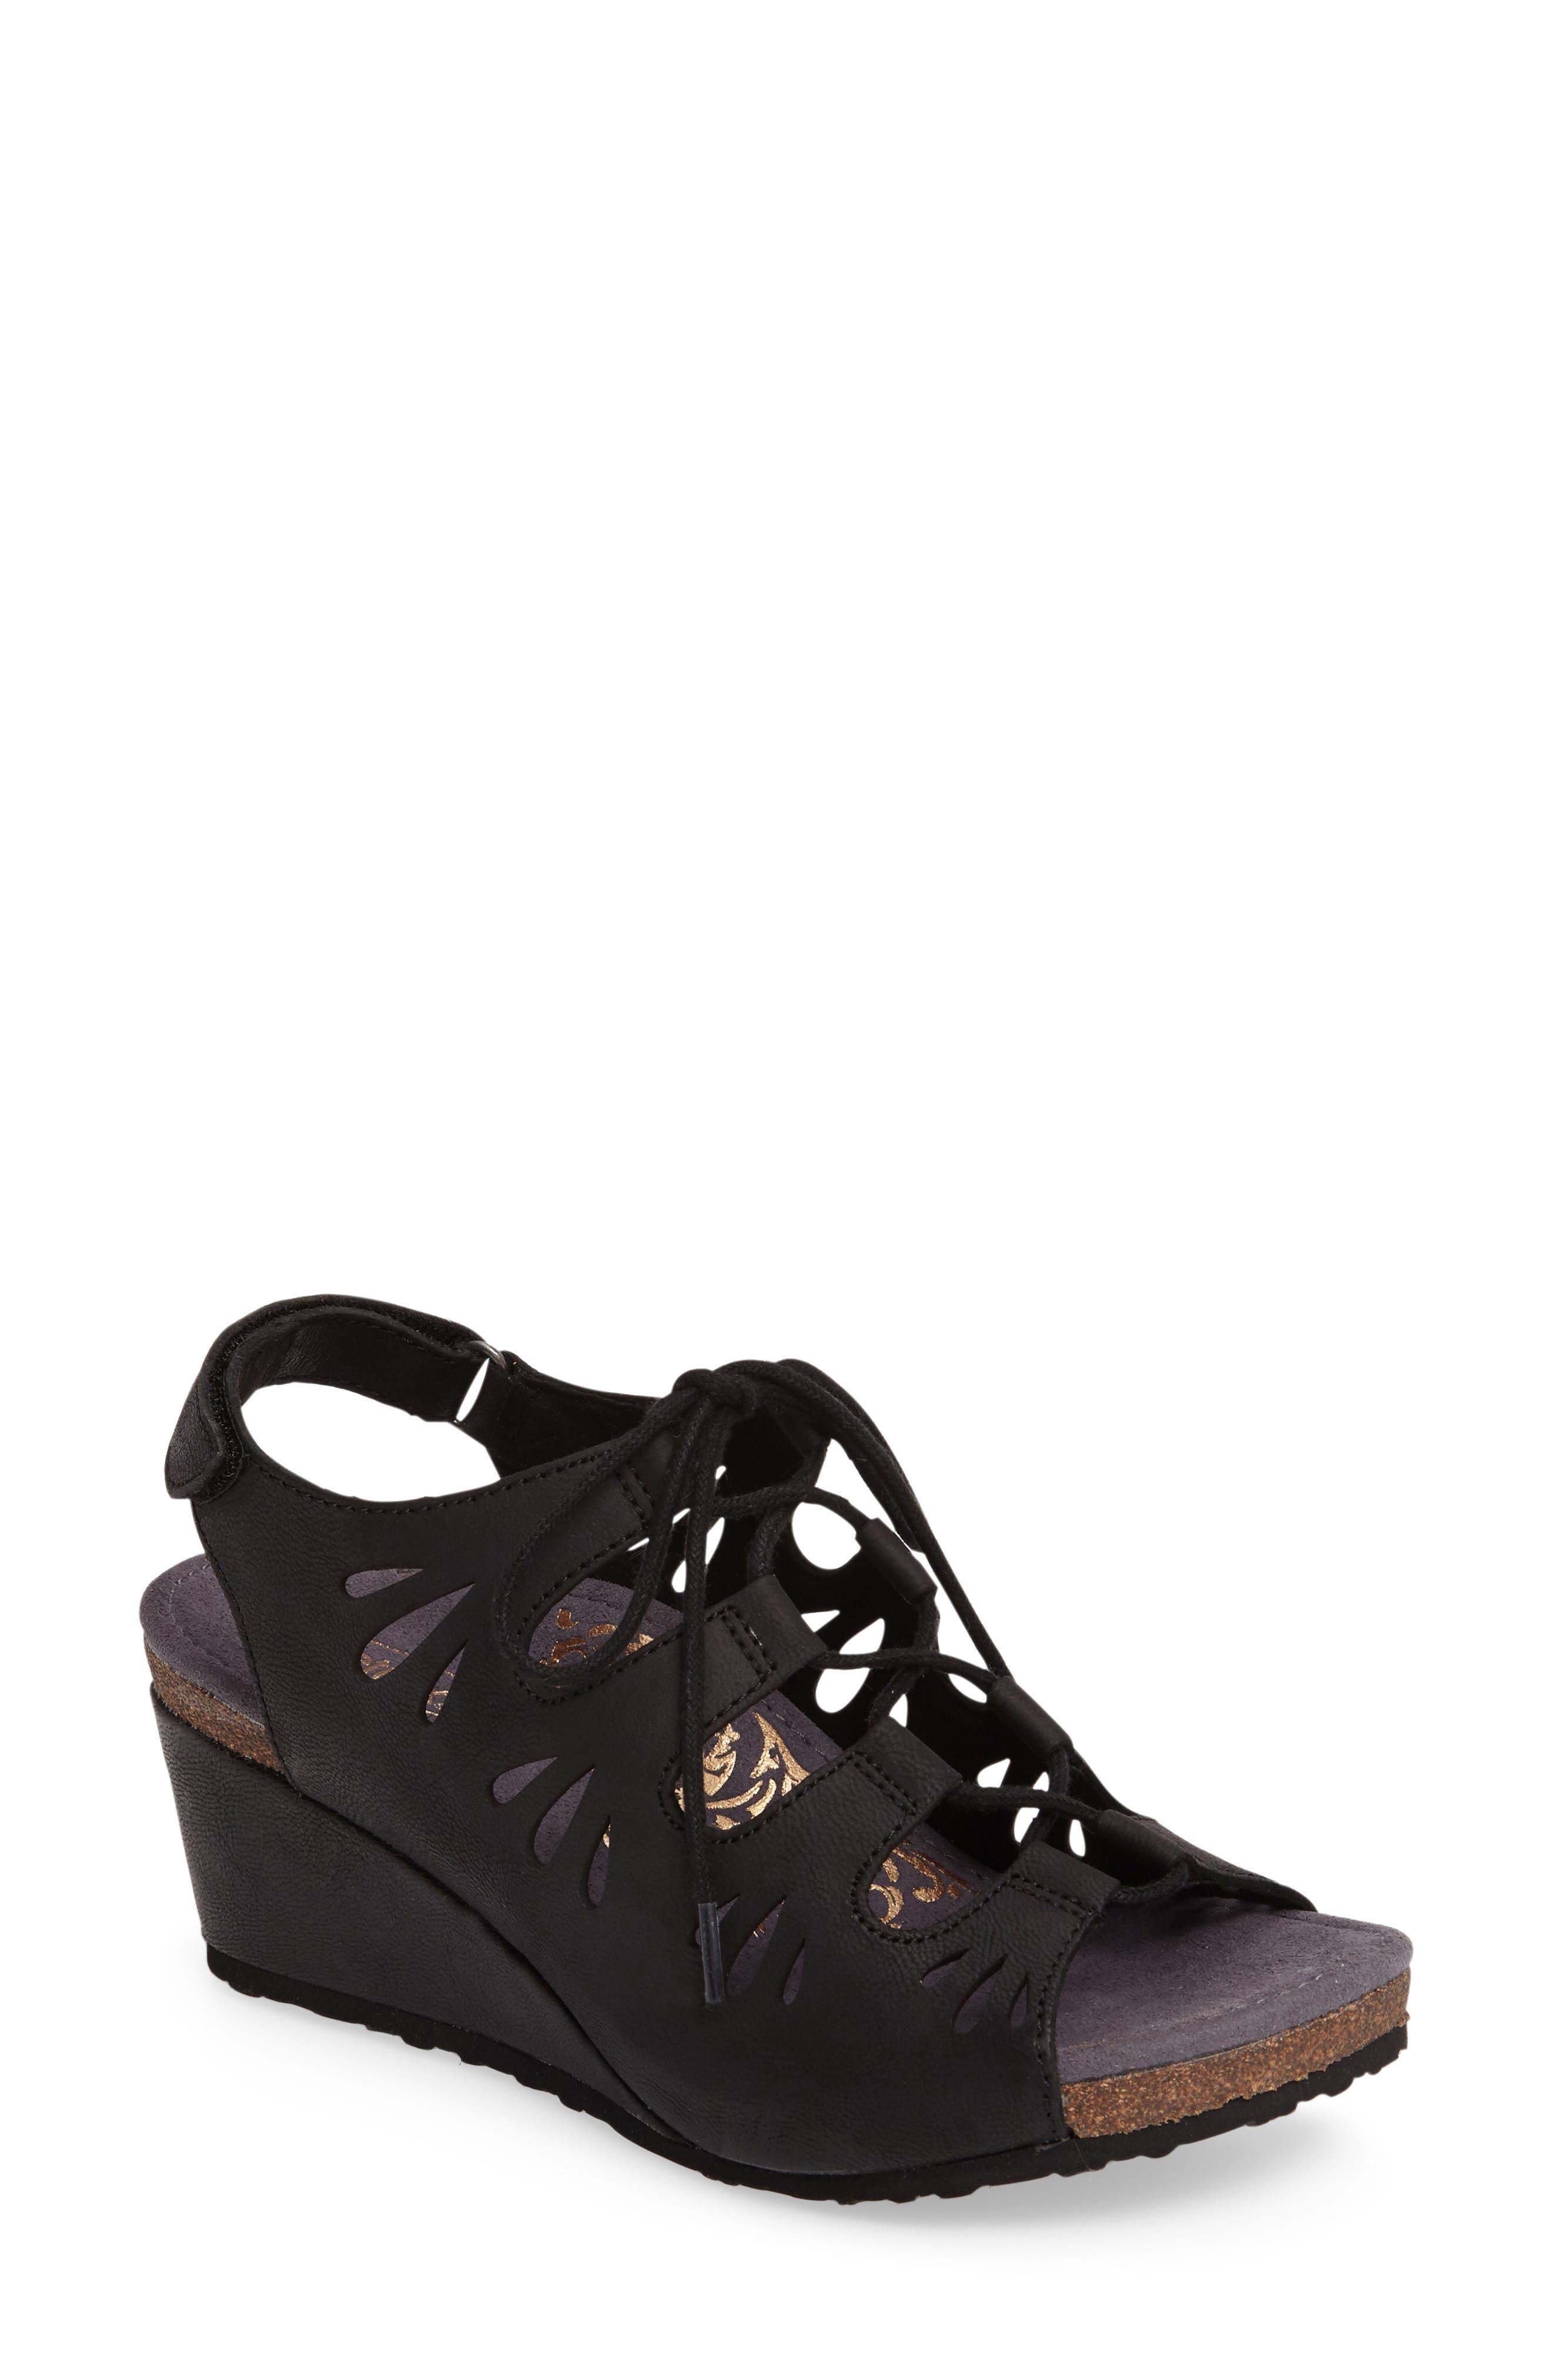 Giselle Slingback Wedge Sandal,                         Main,                         color, Black Leather